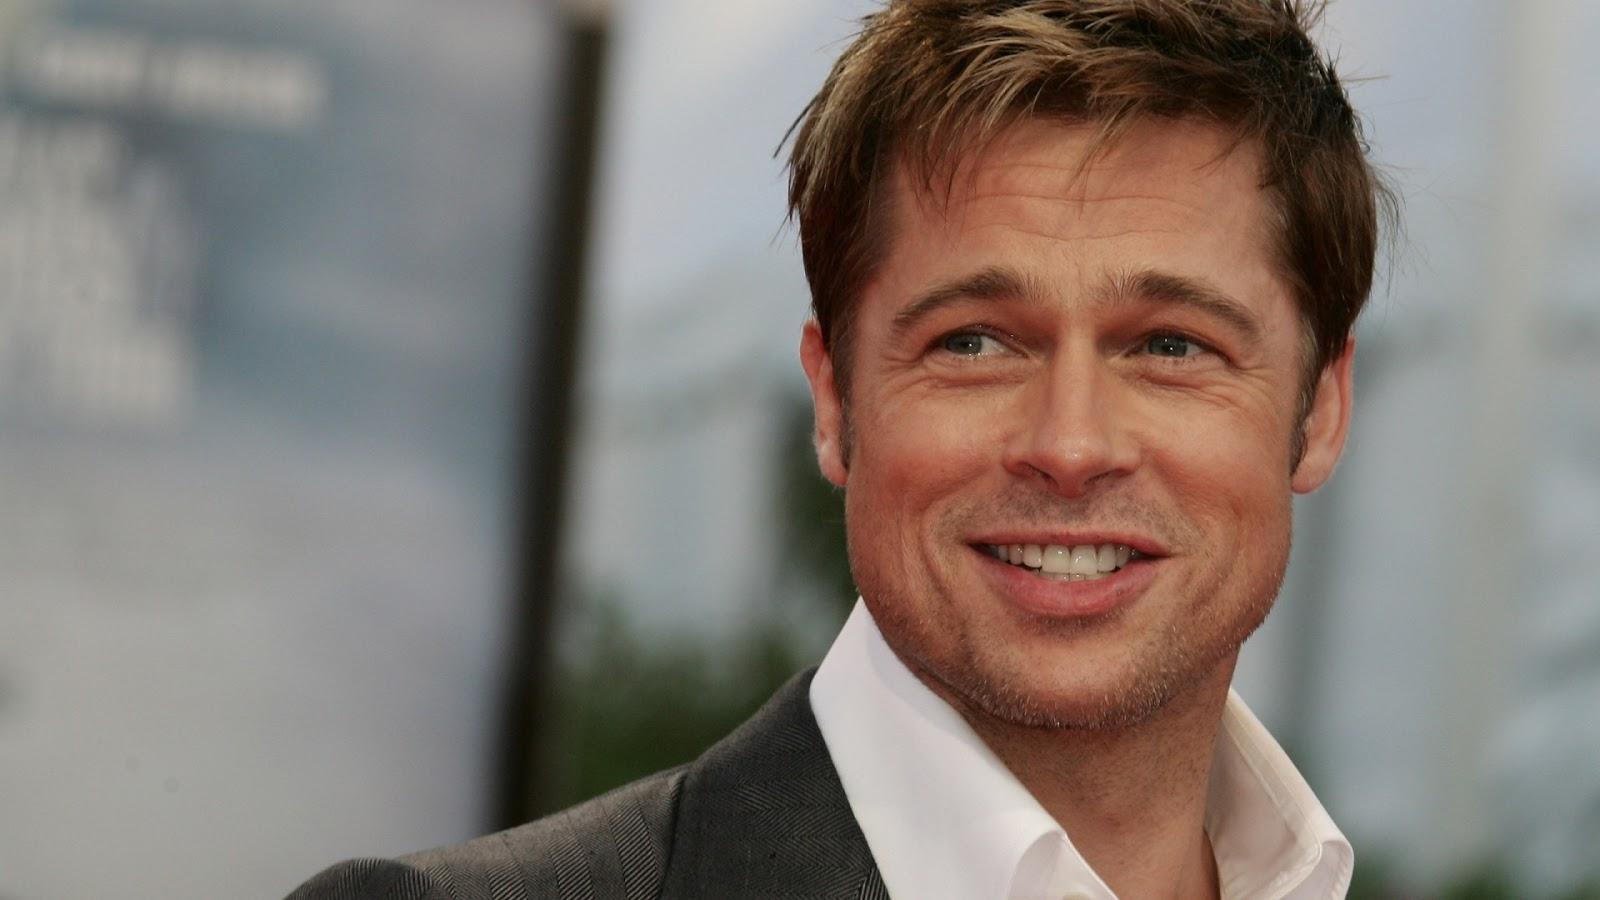 Brad Pitt new smiling HD Wallpapers 1600x900